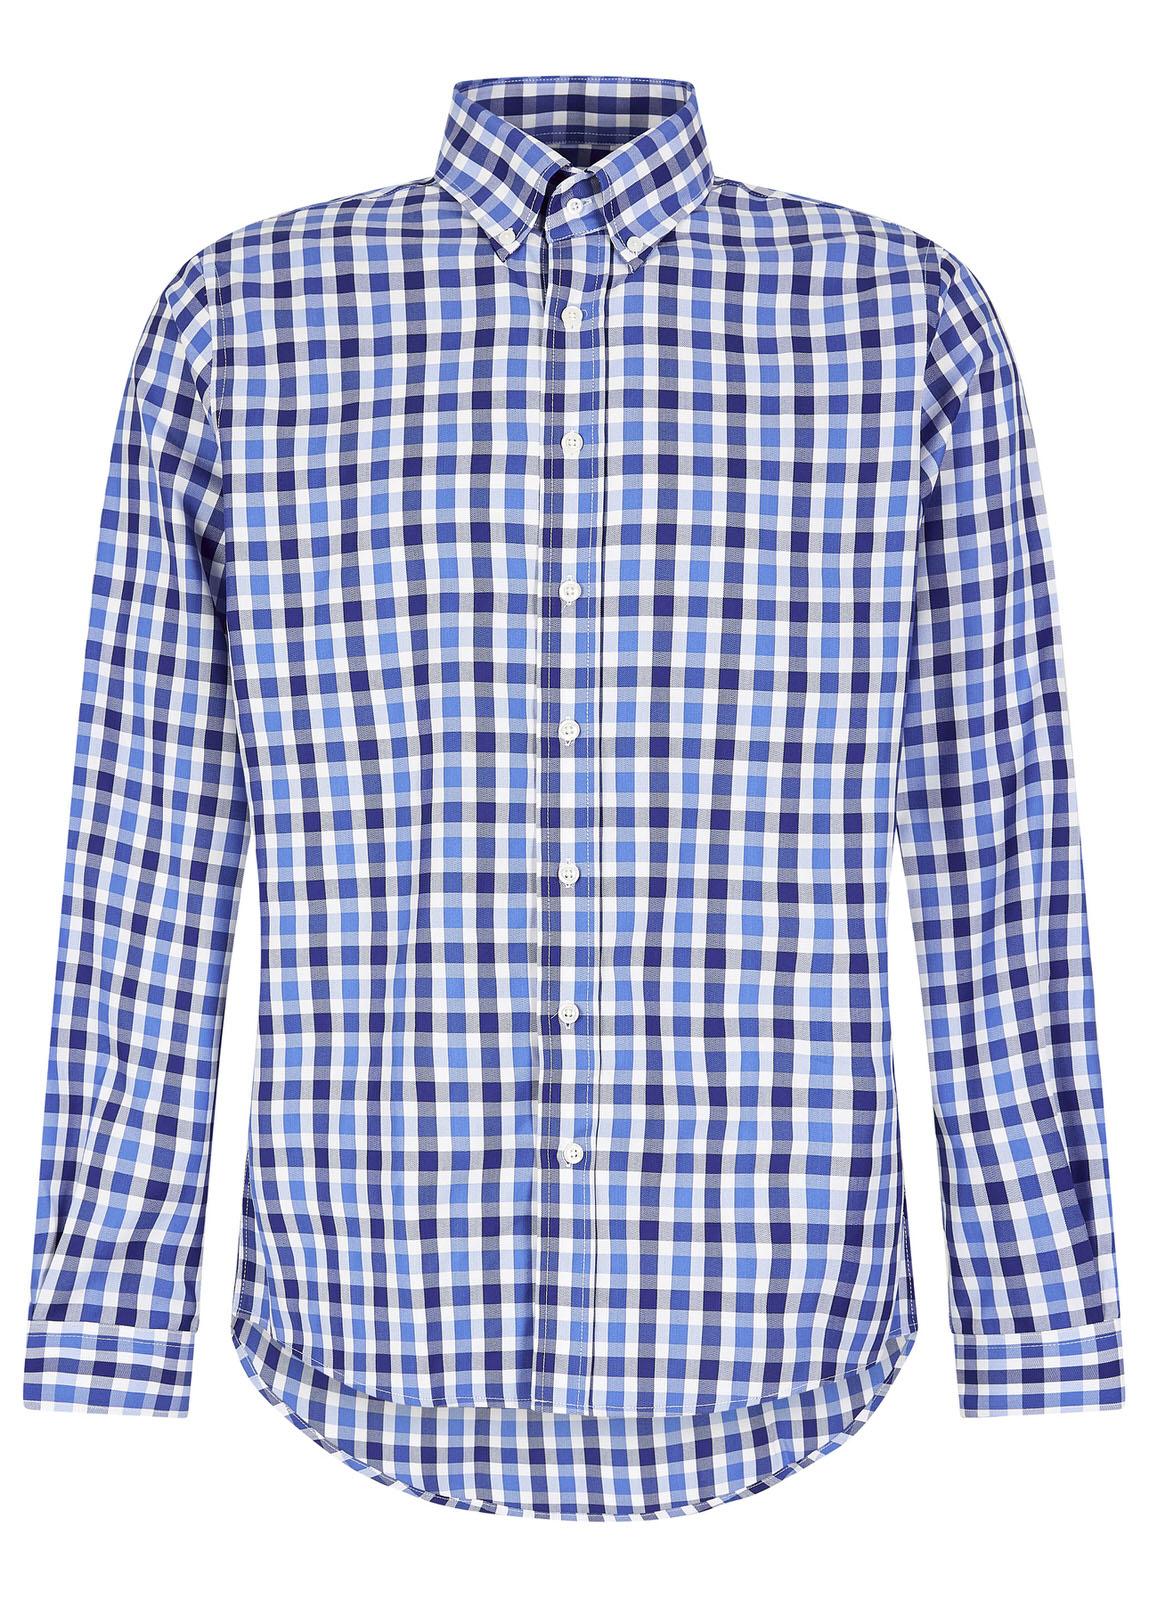 Scottstown_Shirt_Blue_Multi_Image_1